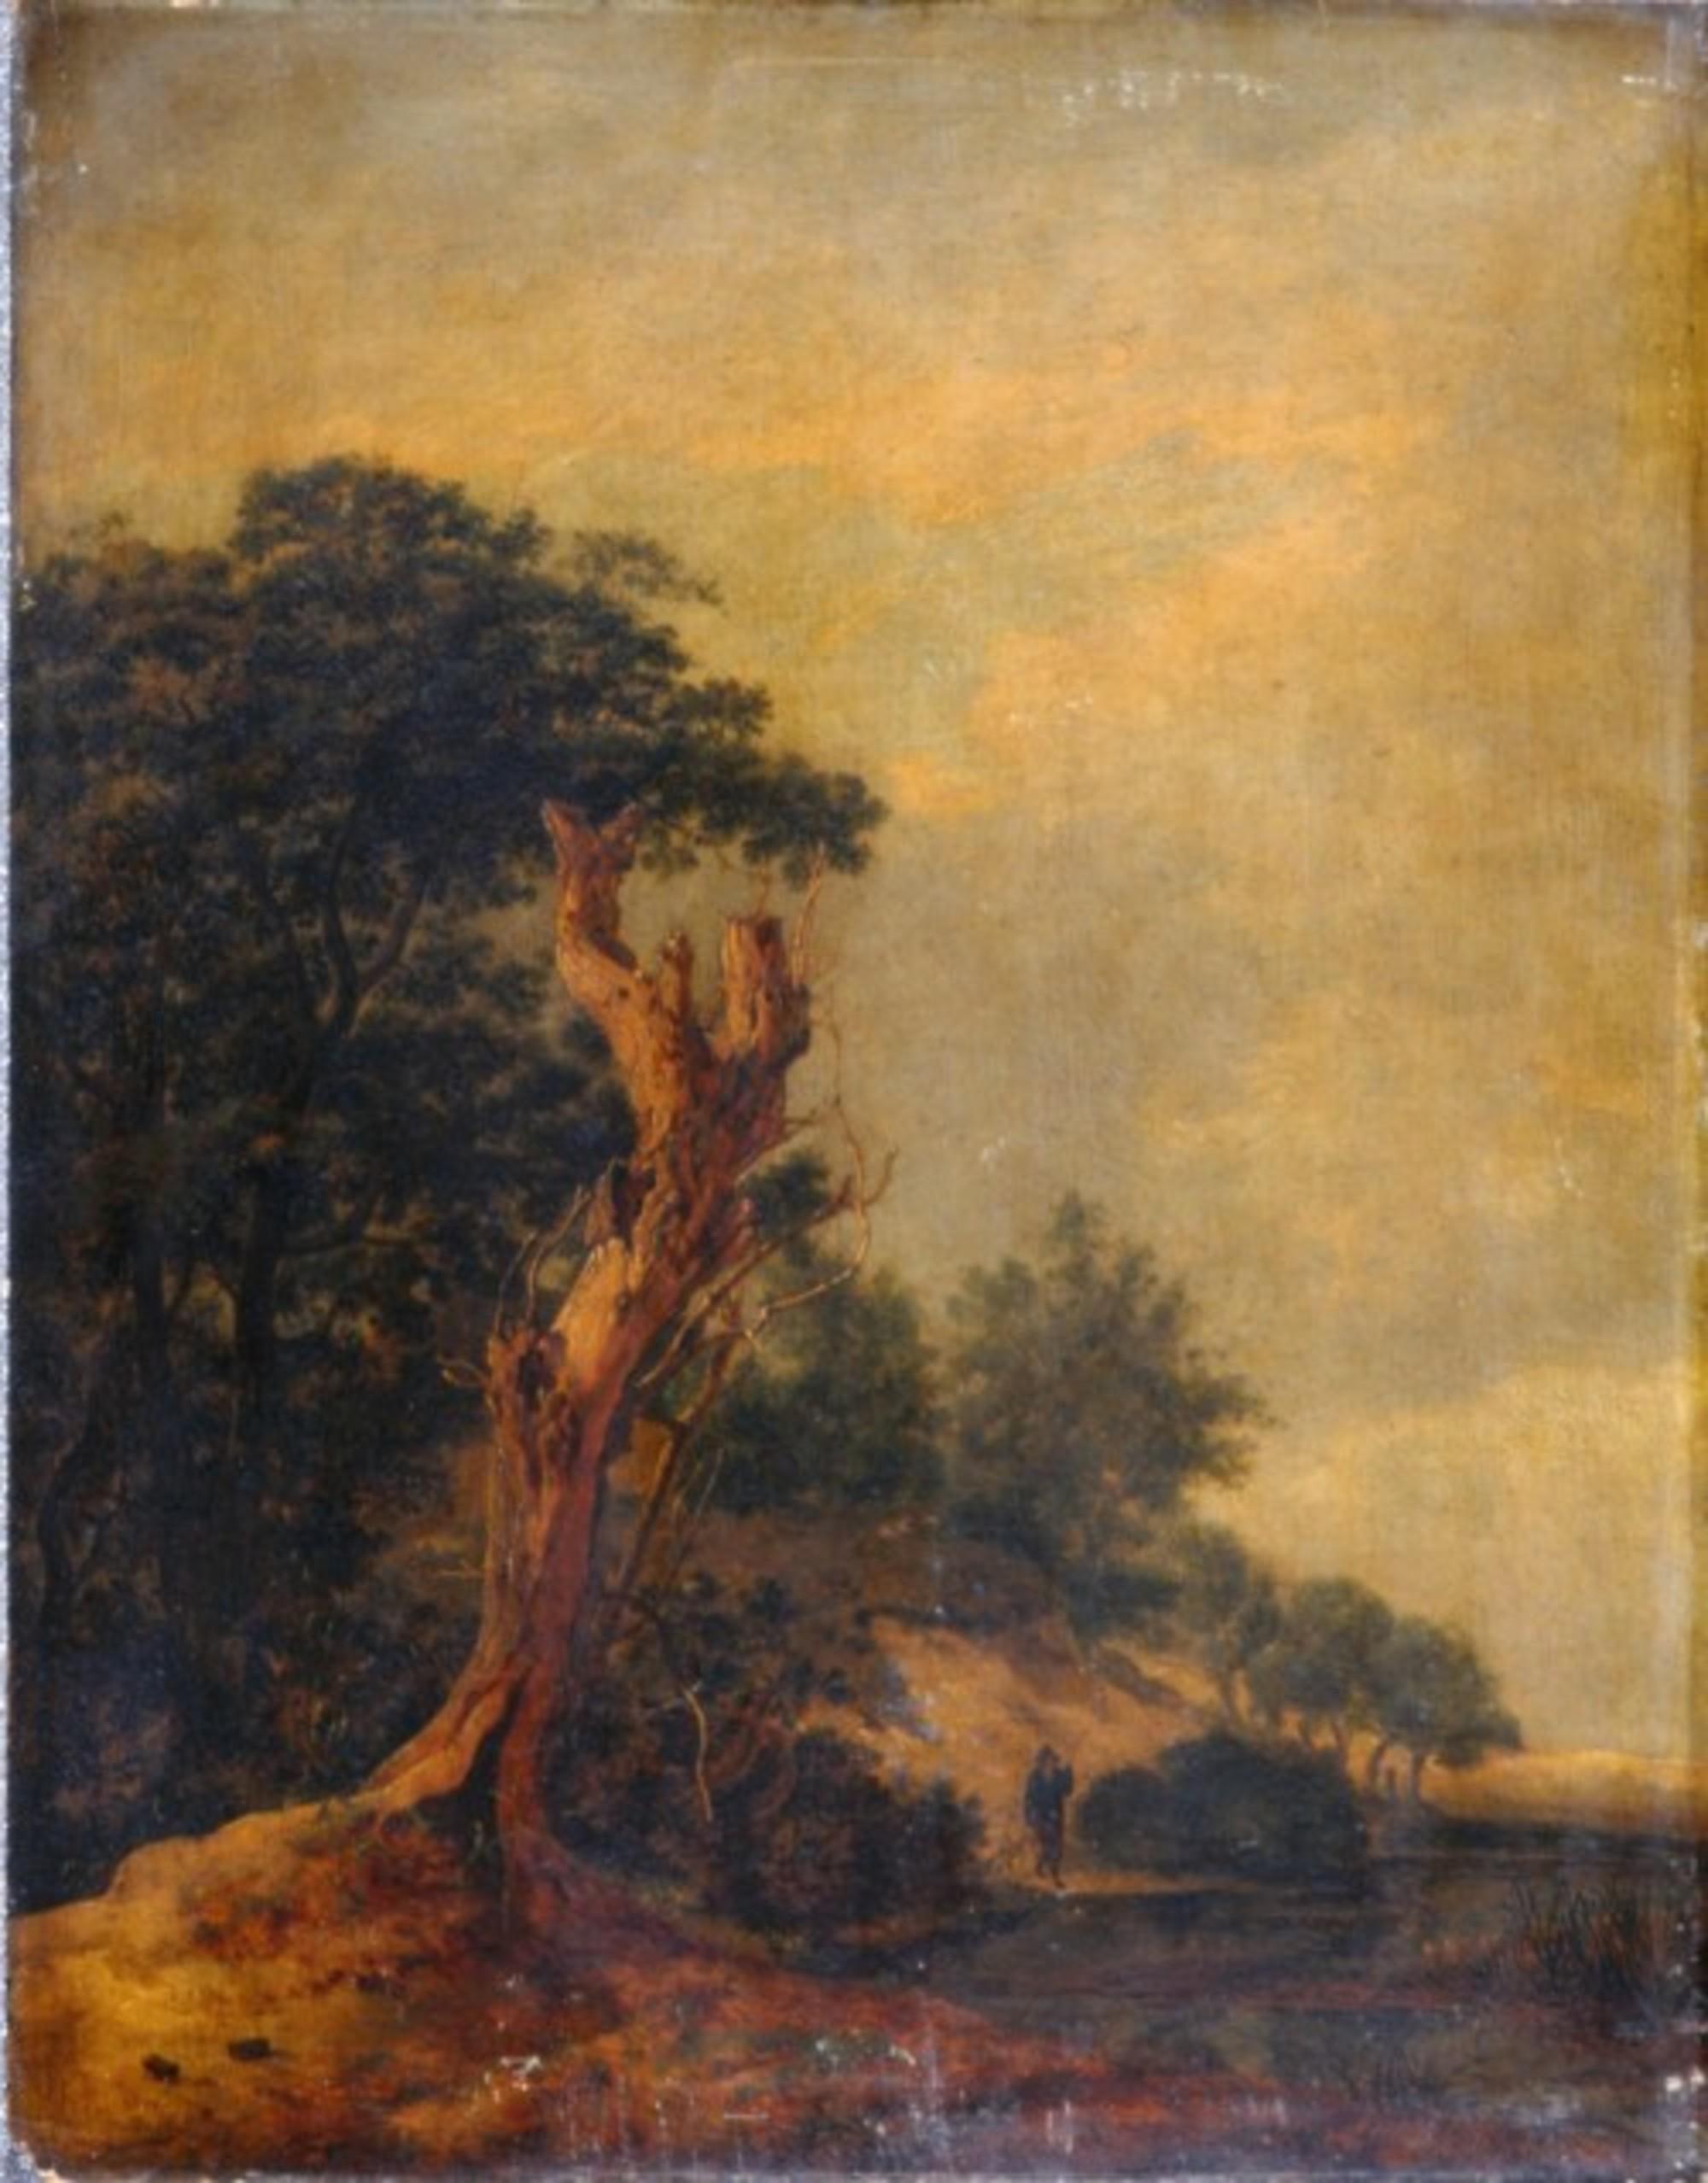 Woodburn-Samuel---Landscape-in-imitation-of-Jacob-Ruisdael---Google-Art-Project.jpg